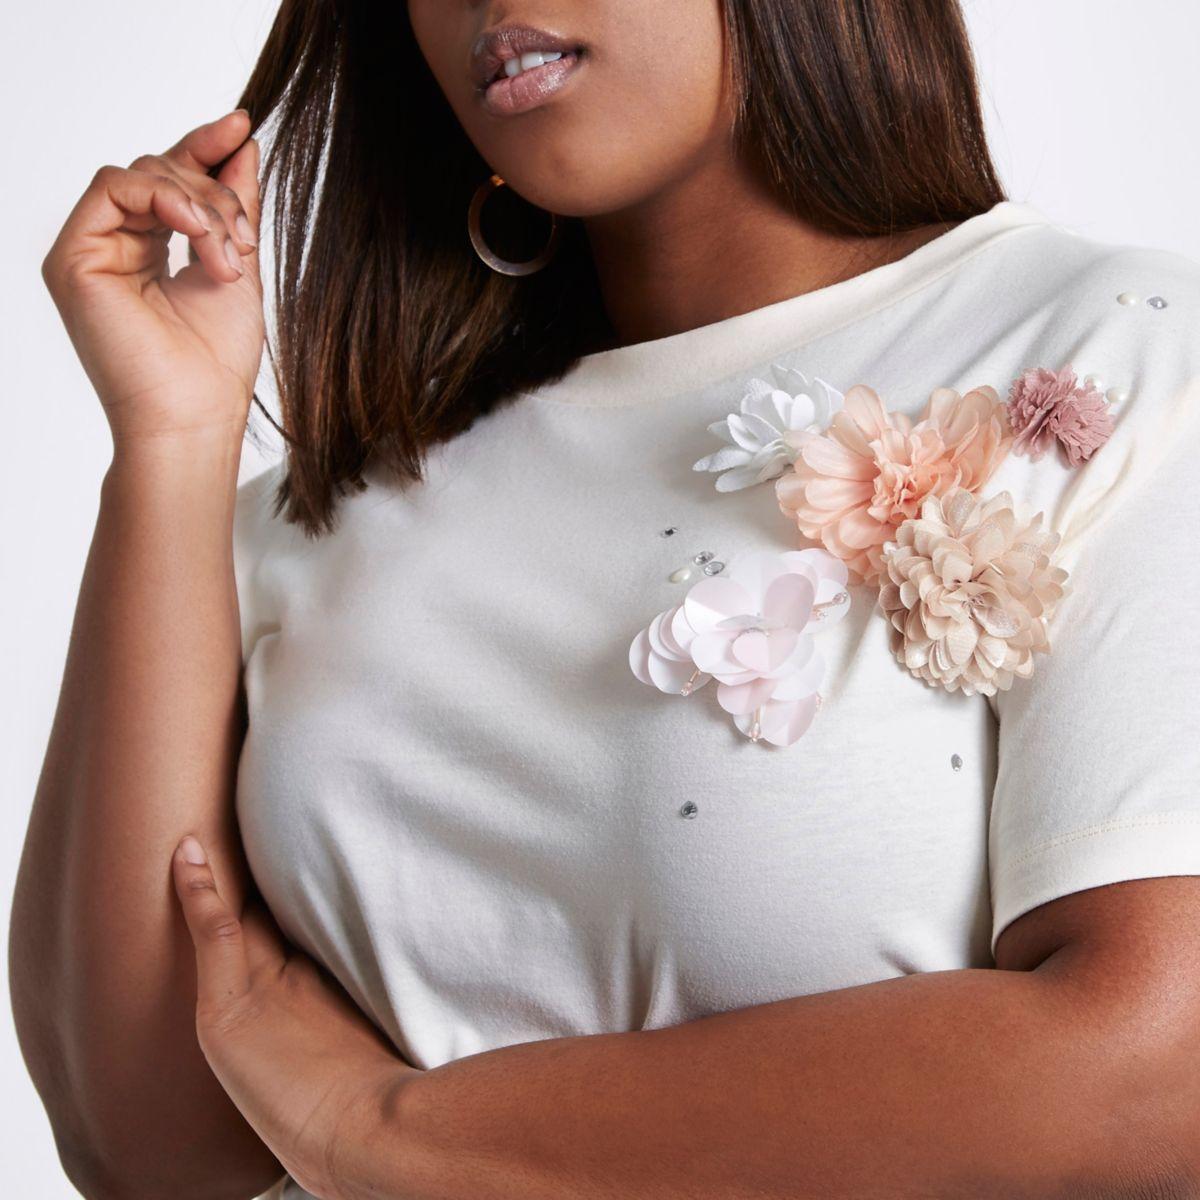 Plus cream floral corsage embellished T-shirt